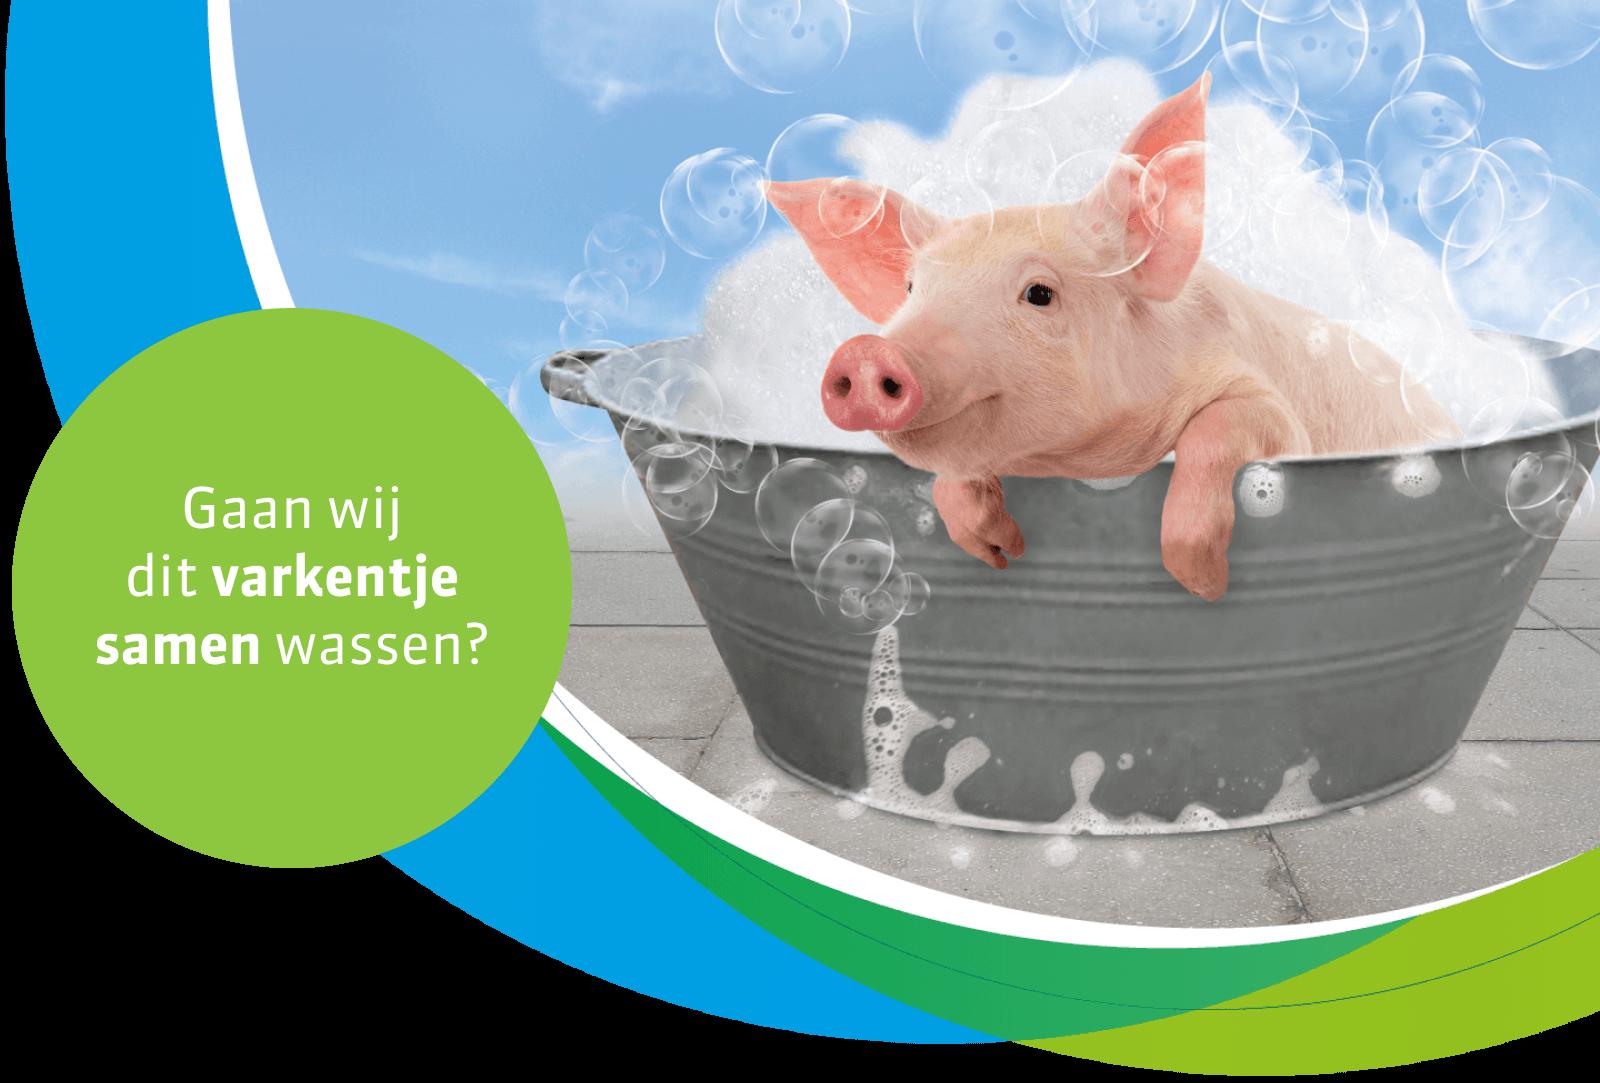 A pig in a tub